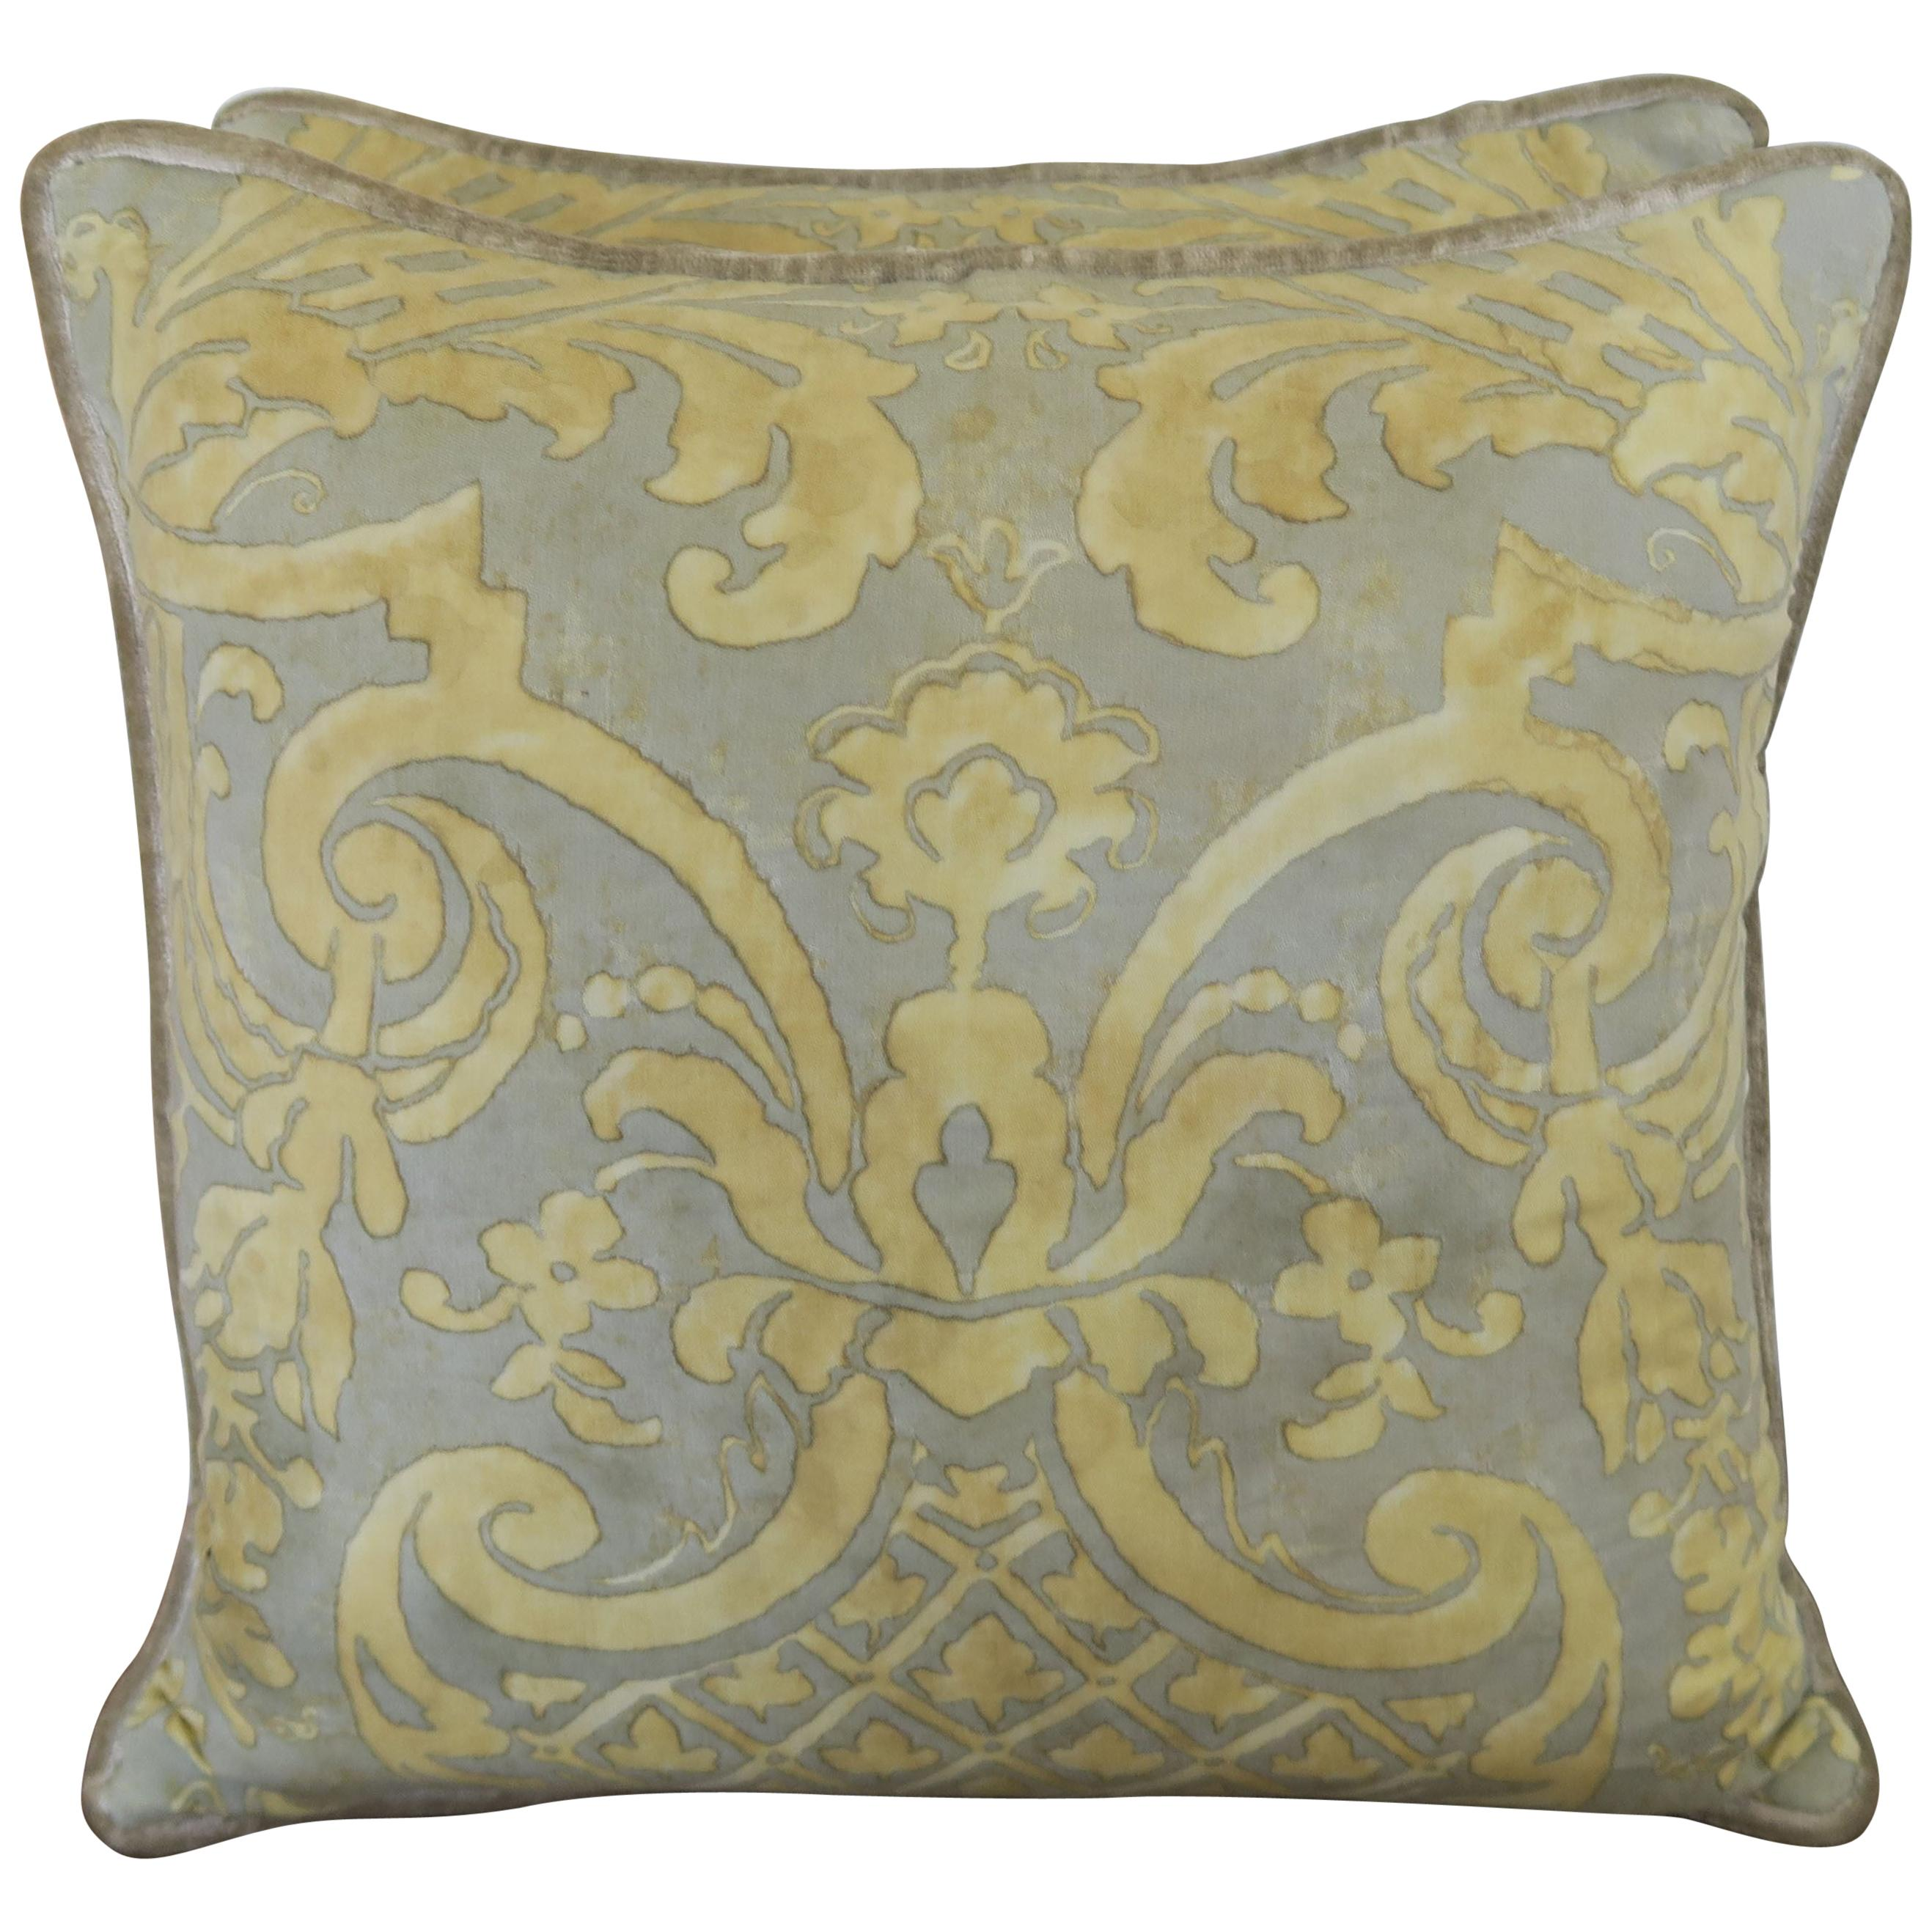 Vintage Carnavalet Fortuny Textile Pillows, a Pair